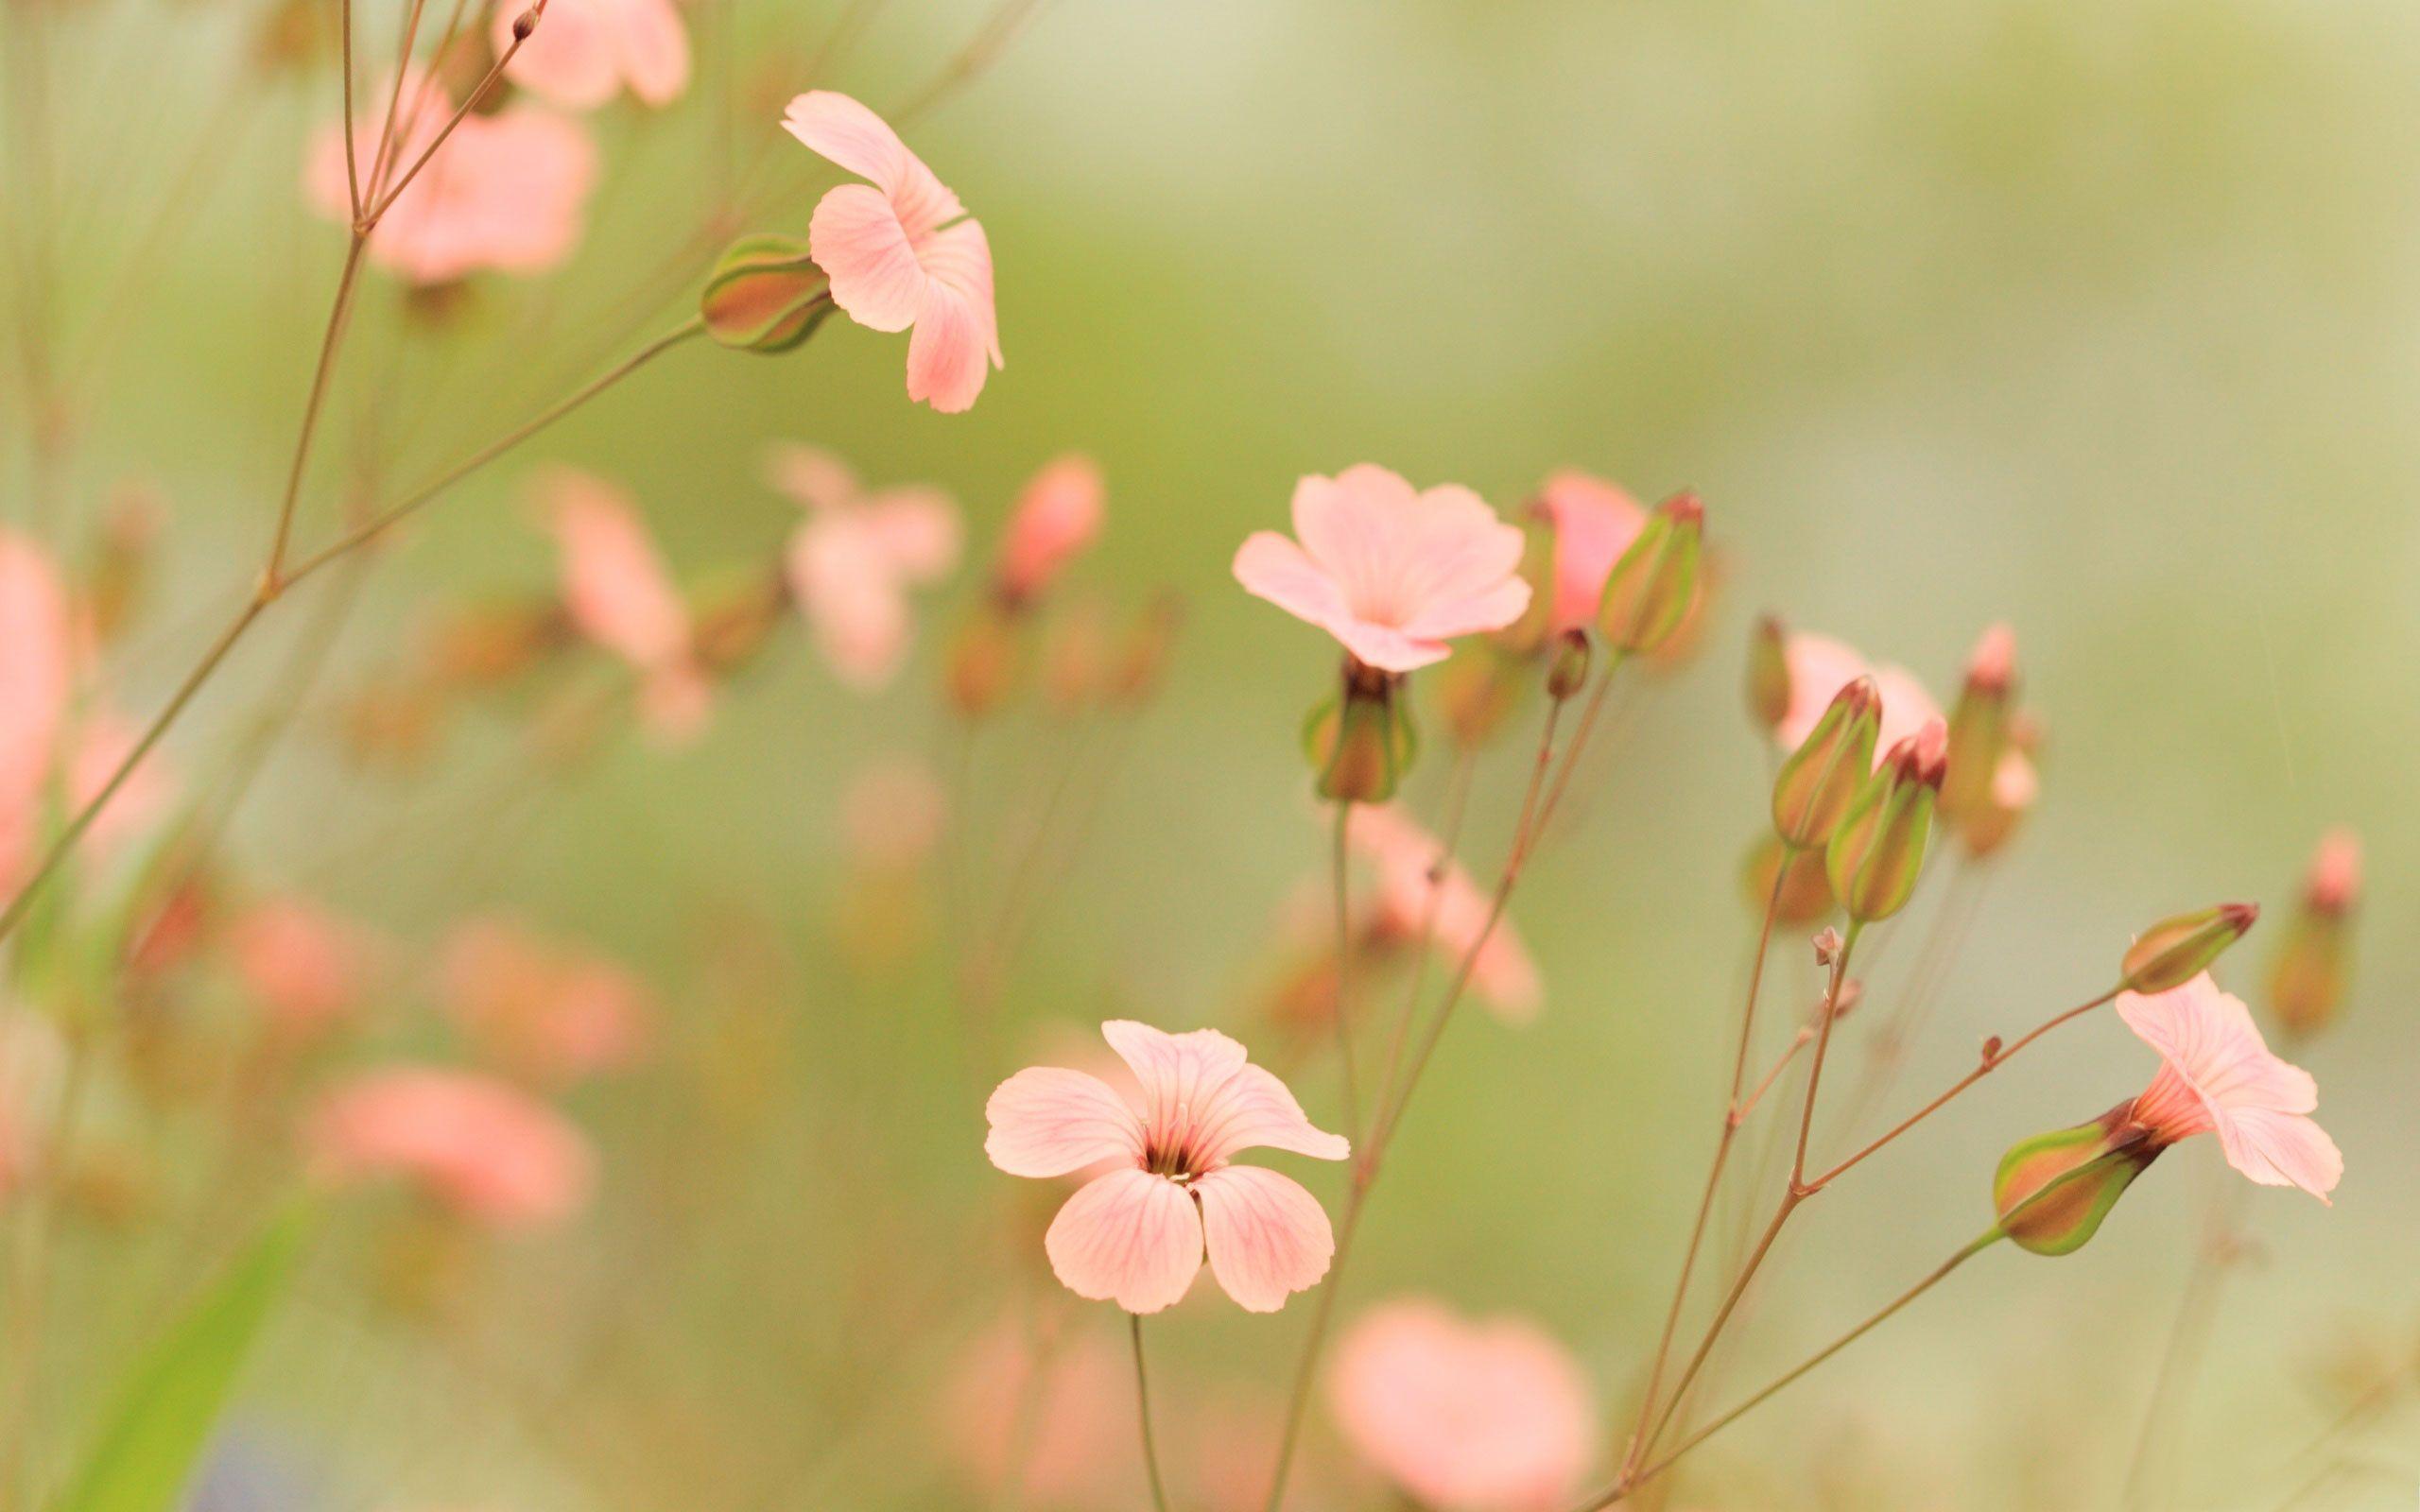 Summer Flowers Wallpapers Summer Flowers Desktop Background 2085038 Hd Wallpaper Backgrounds Download